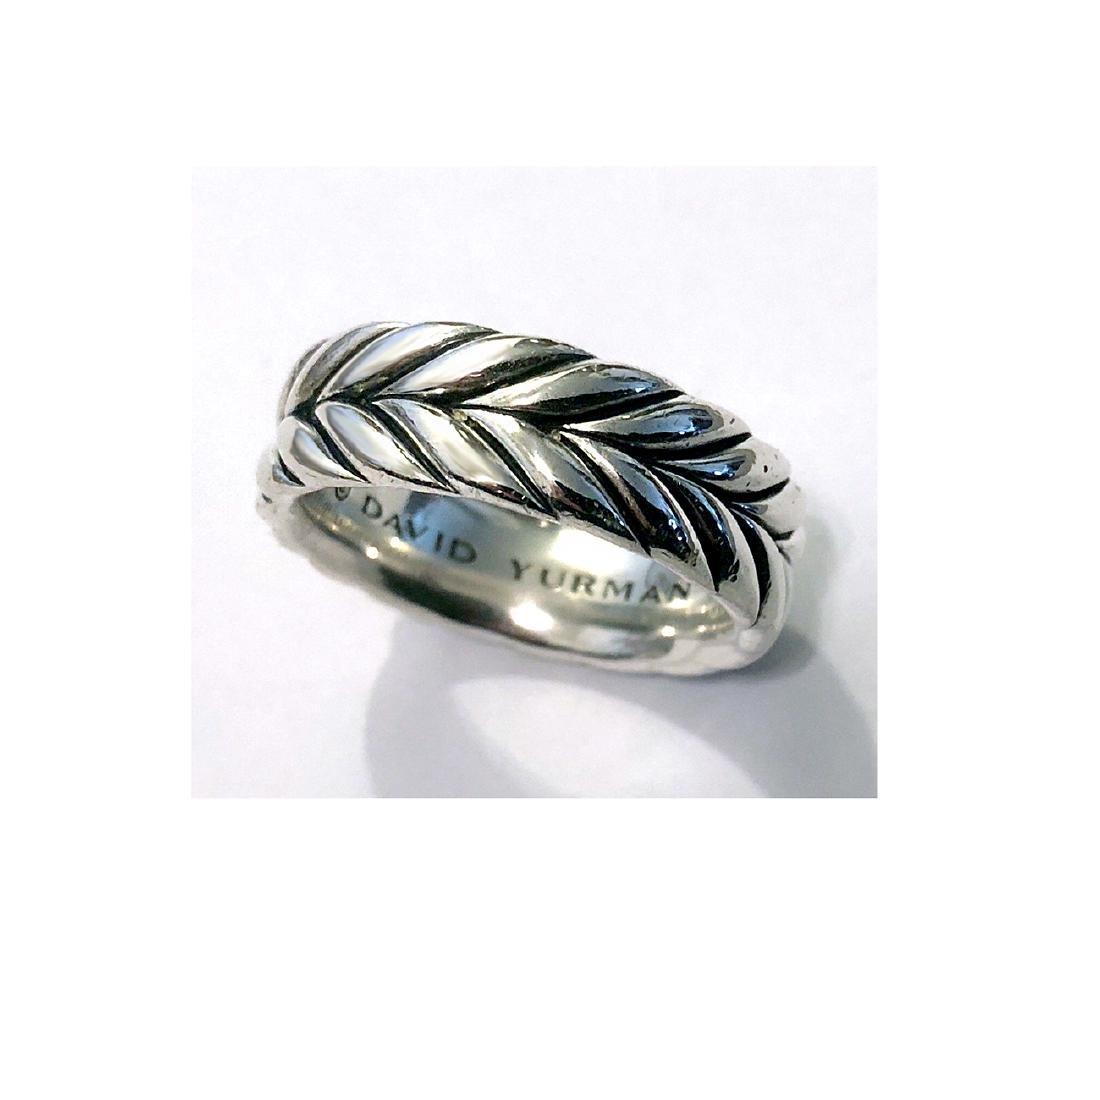 David Yurman Sterling Silver Chevron MenÂ's Ring sz - 3